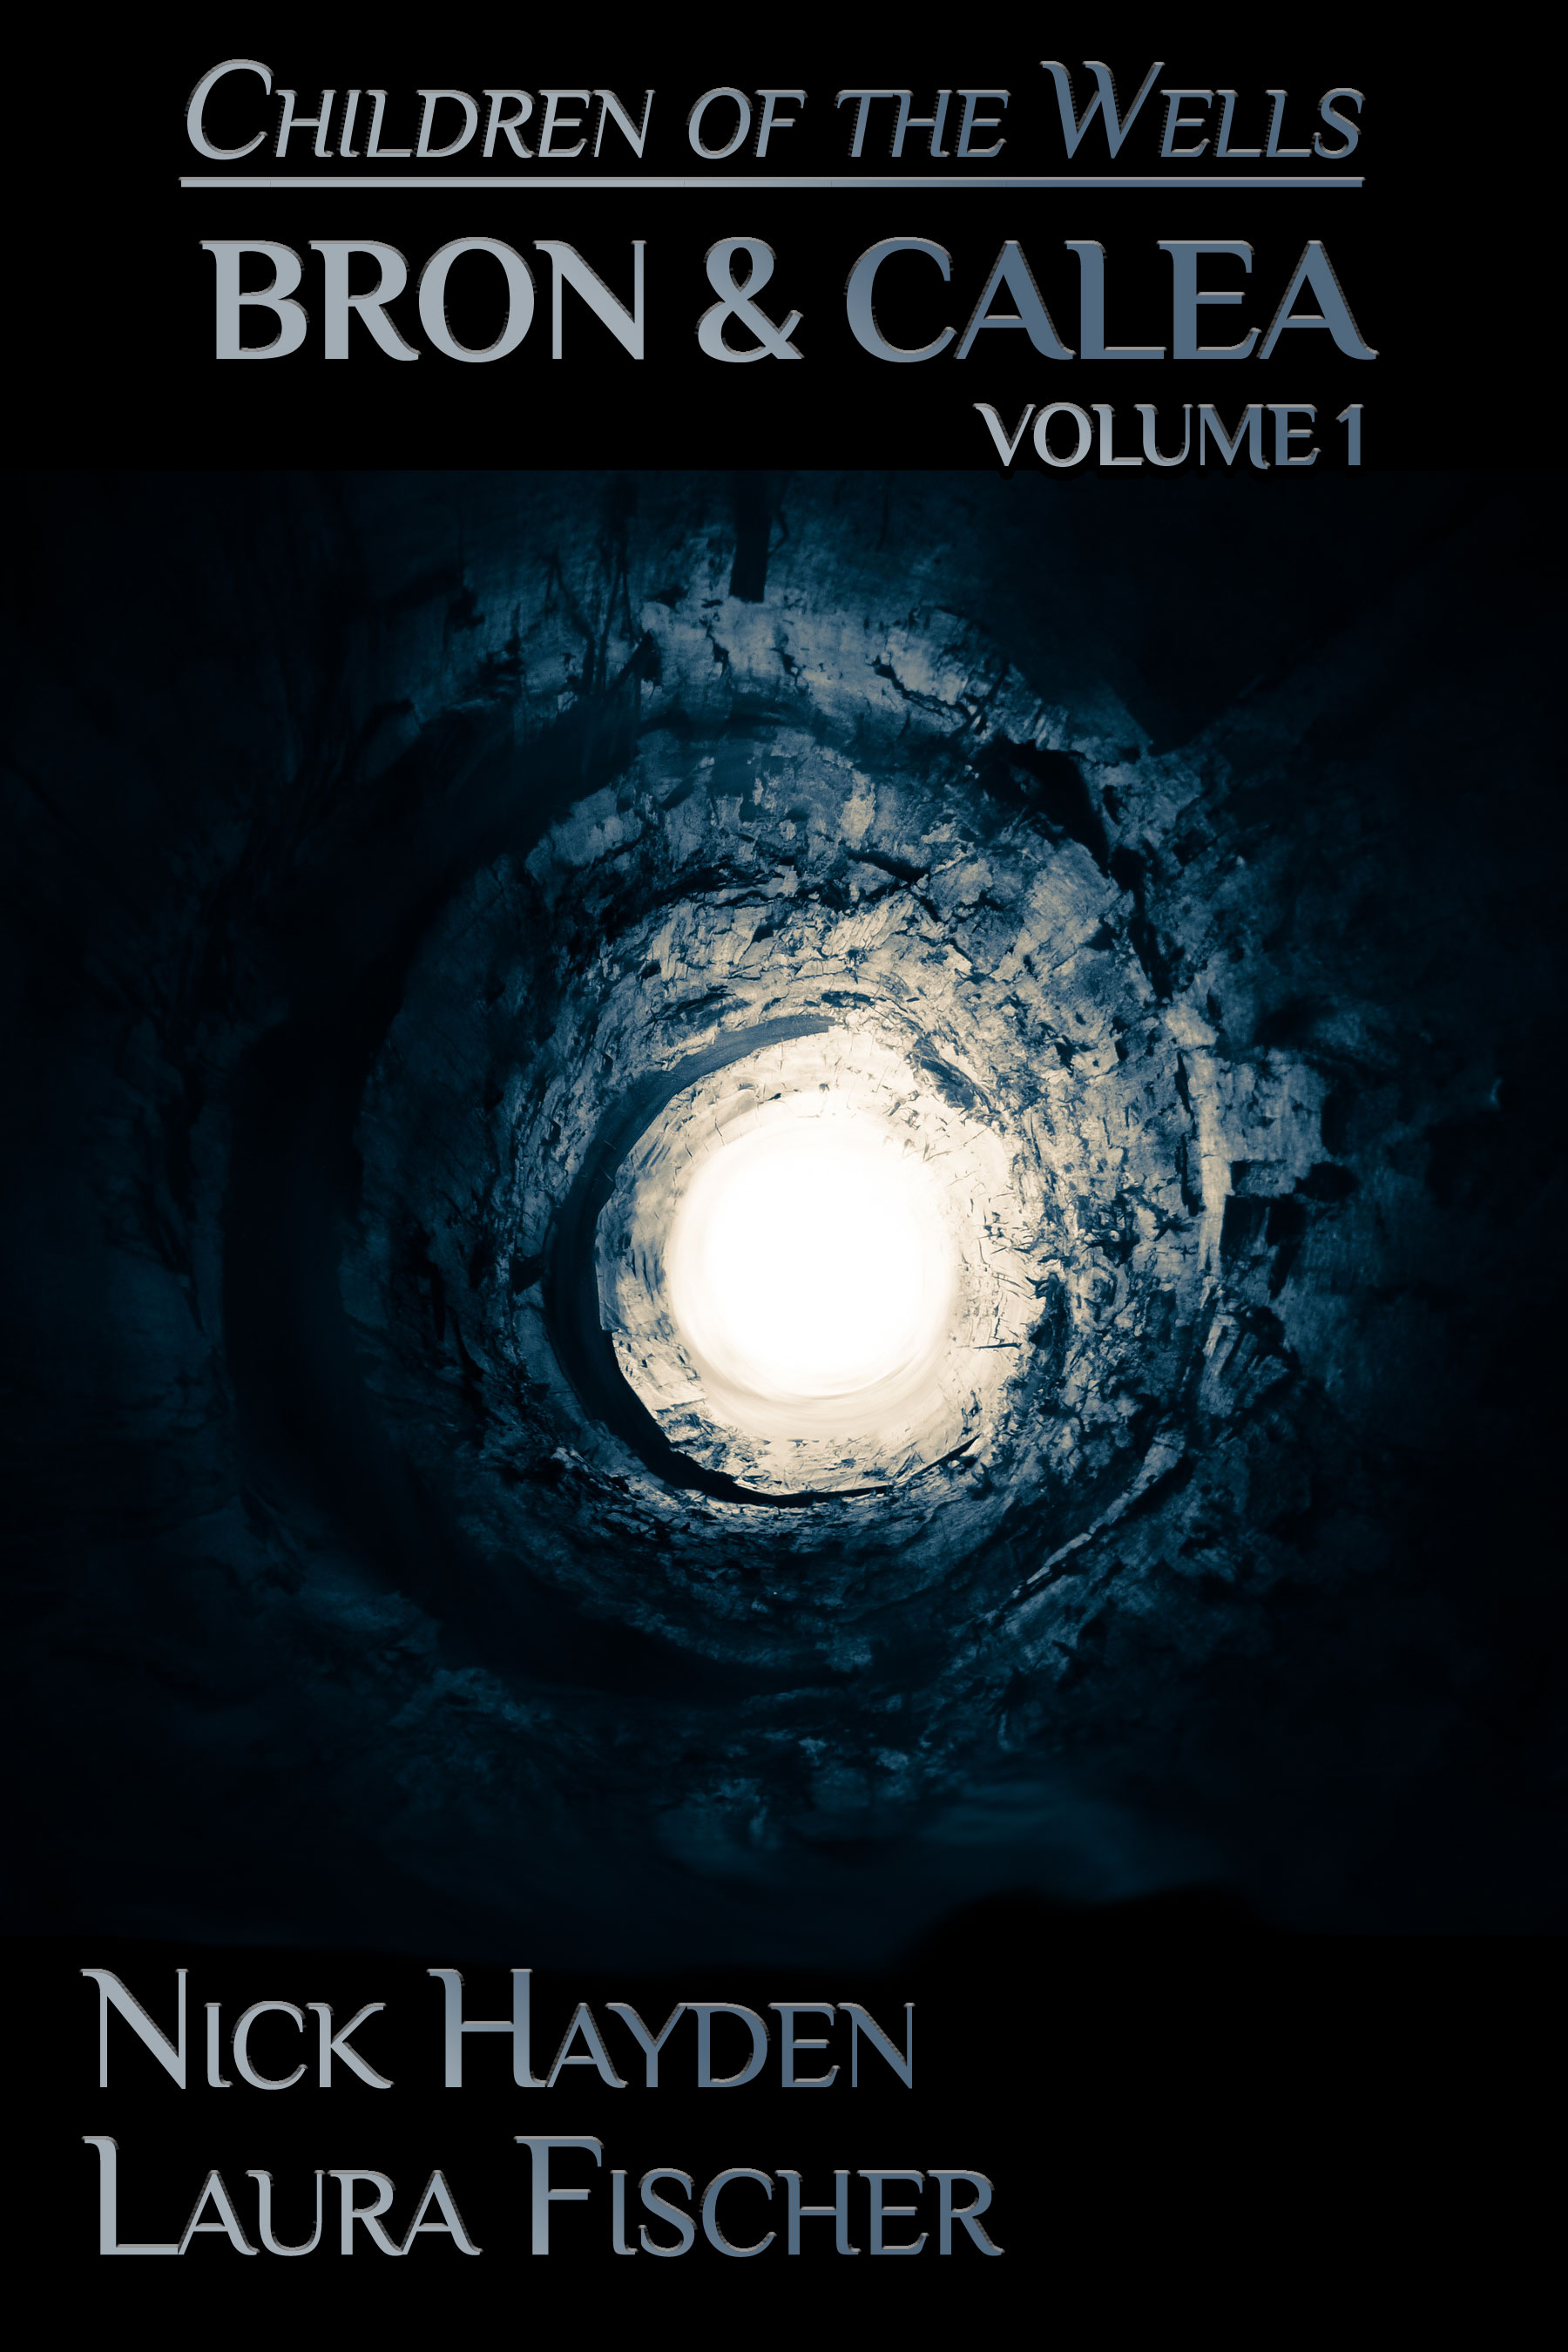 Bron & Calea Volume 1